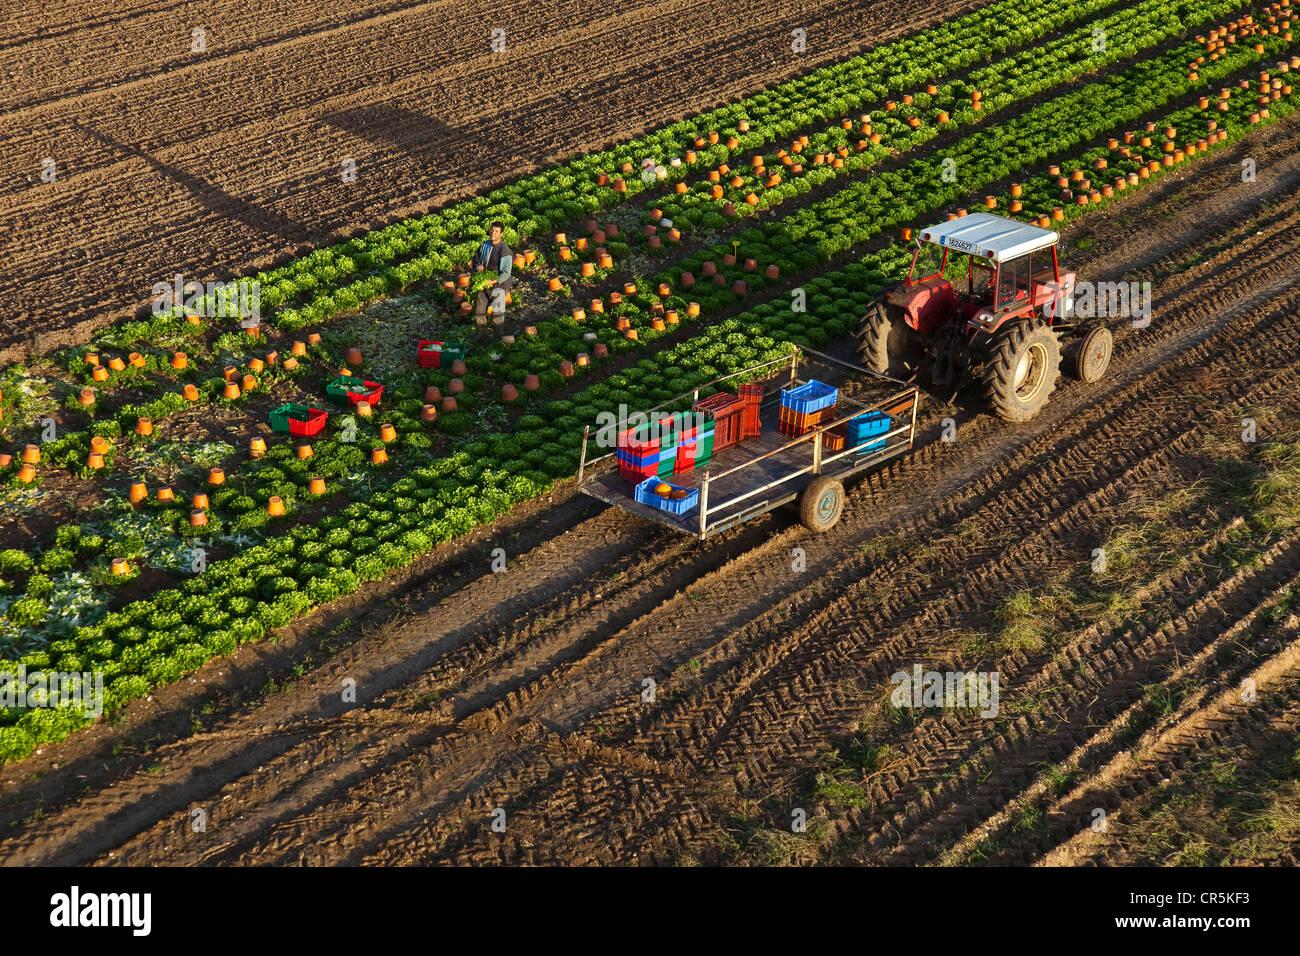 Market Gardening Stock Photos & Market Gardening Stock Images - Alamy